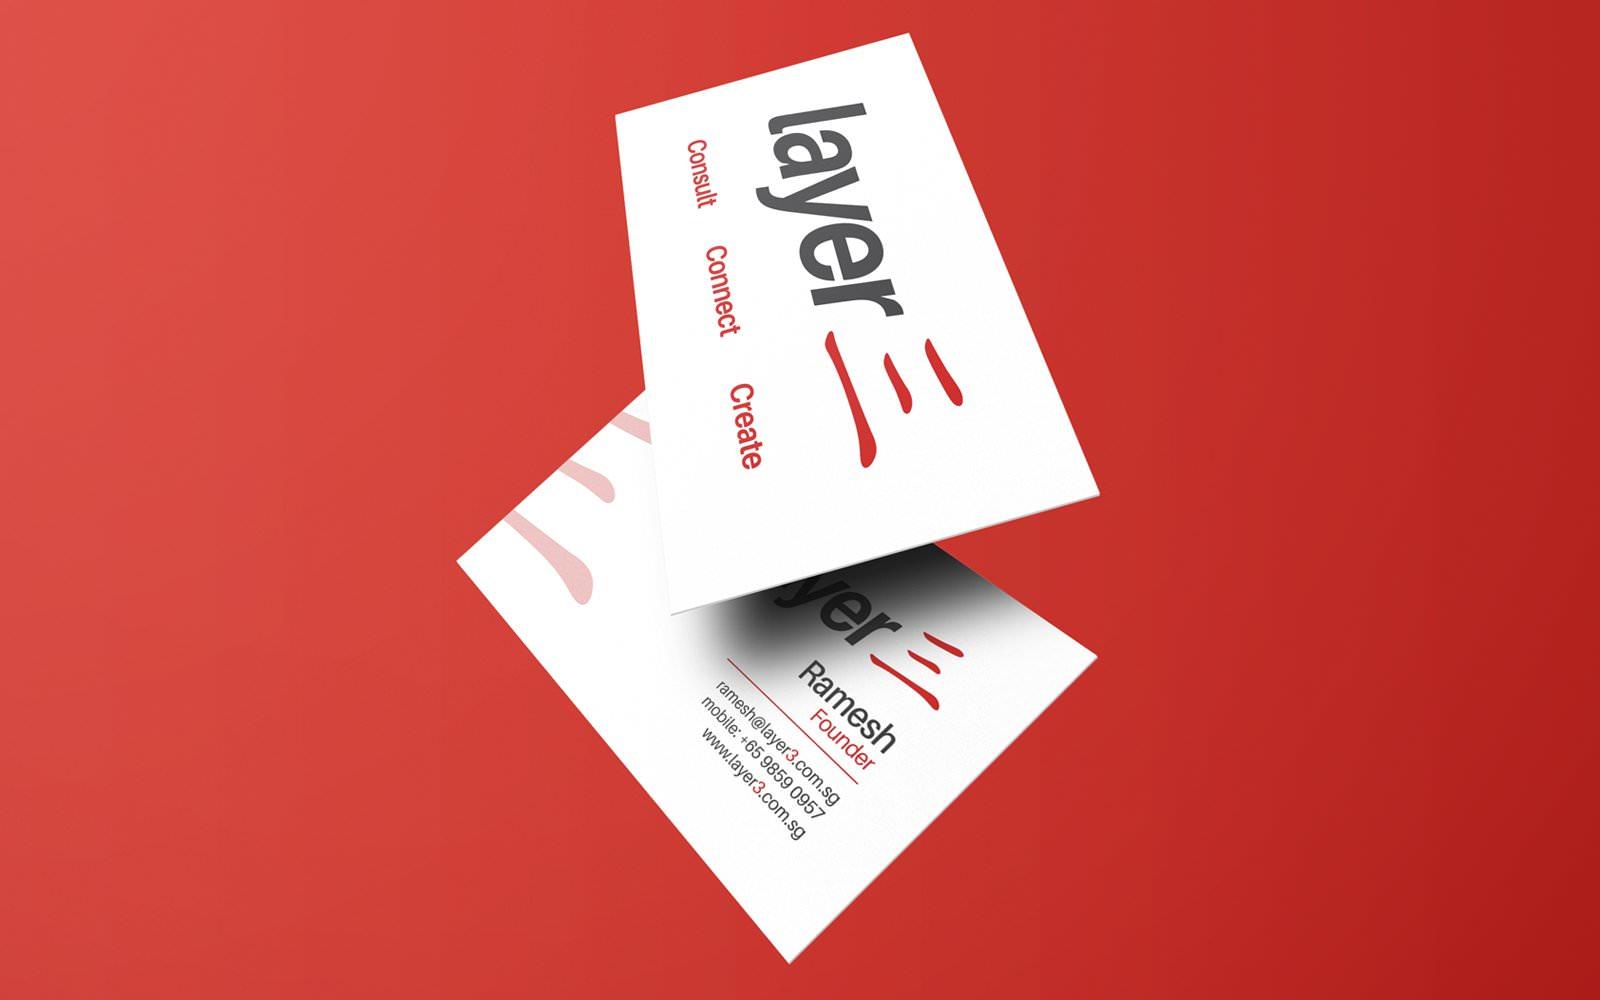 layer3 name card design